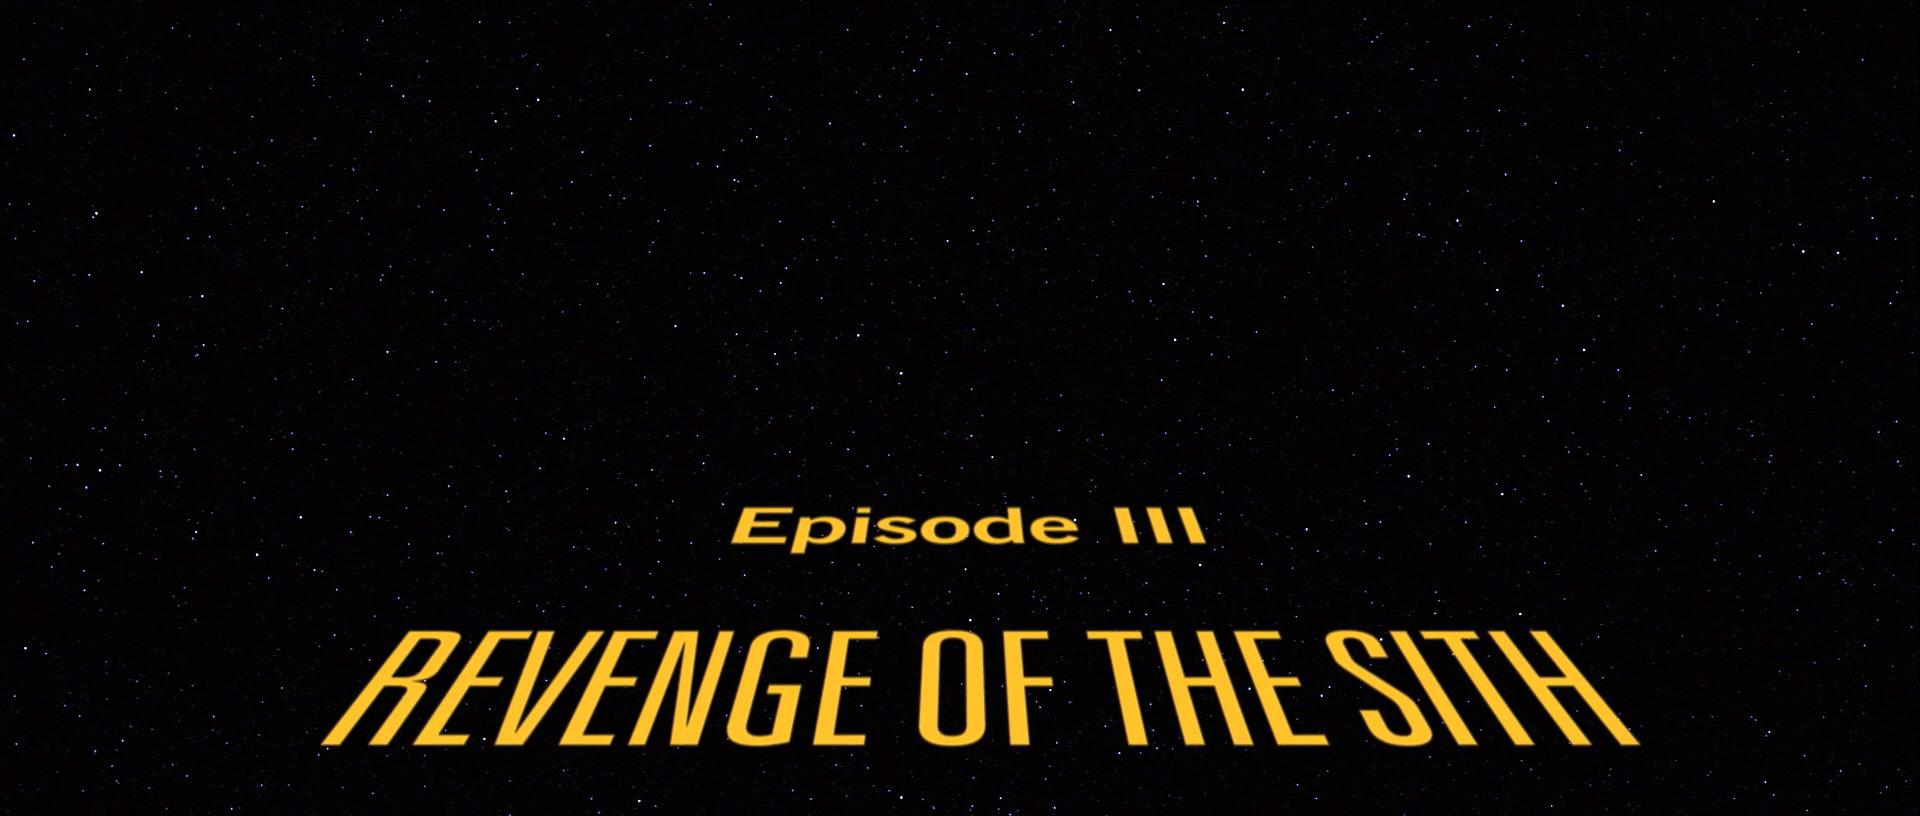 Star Wars Episode III: Revenge of the Sith (2005)